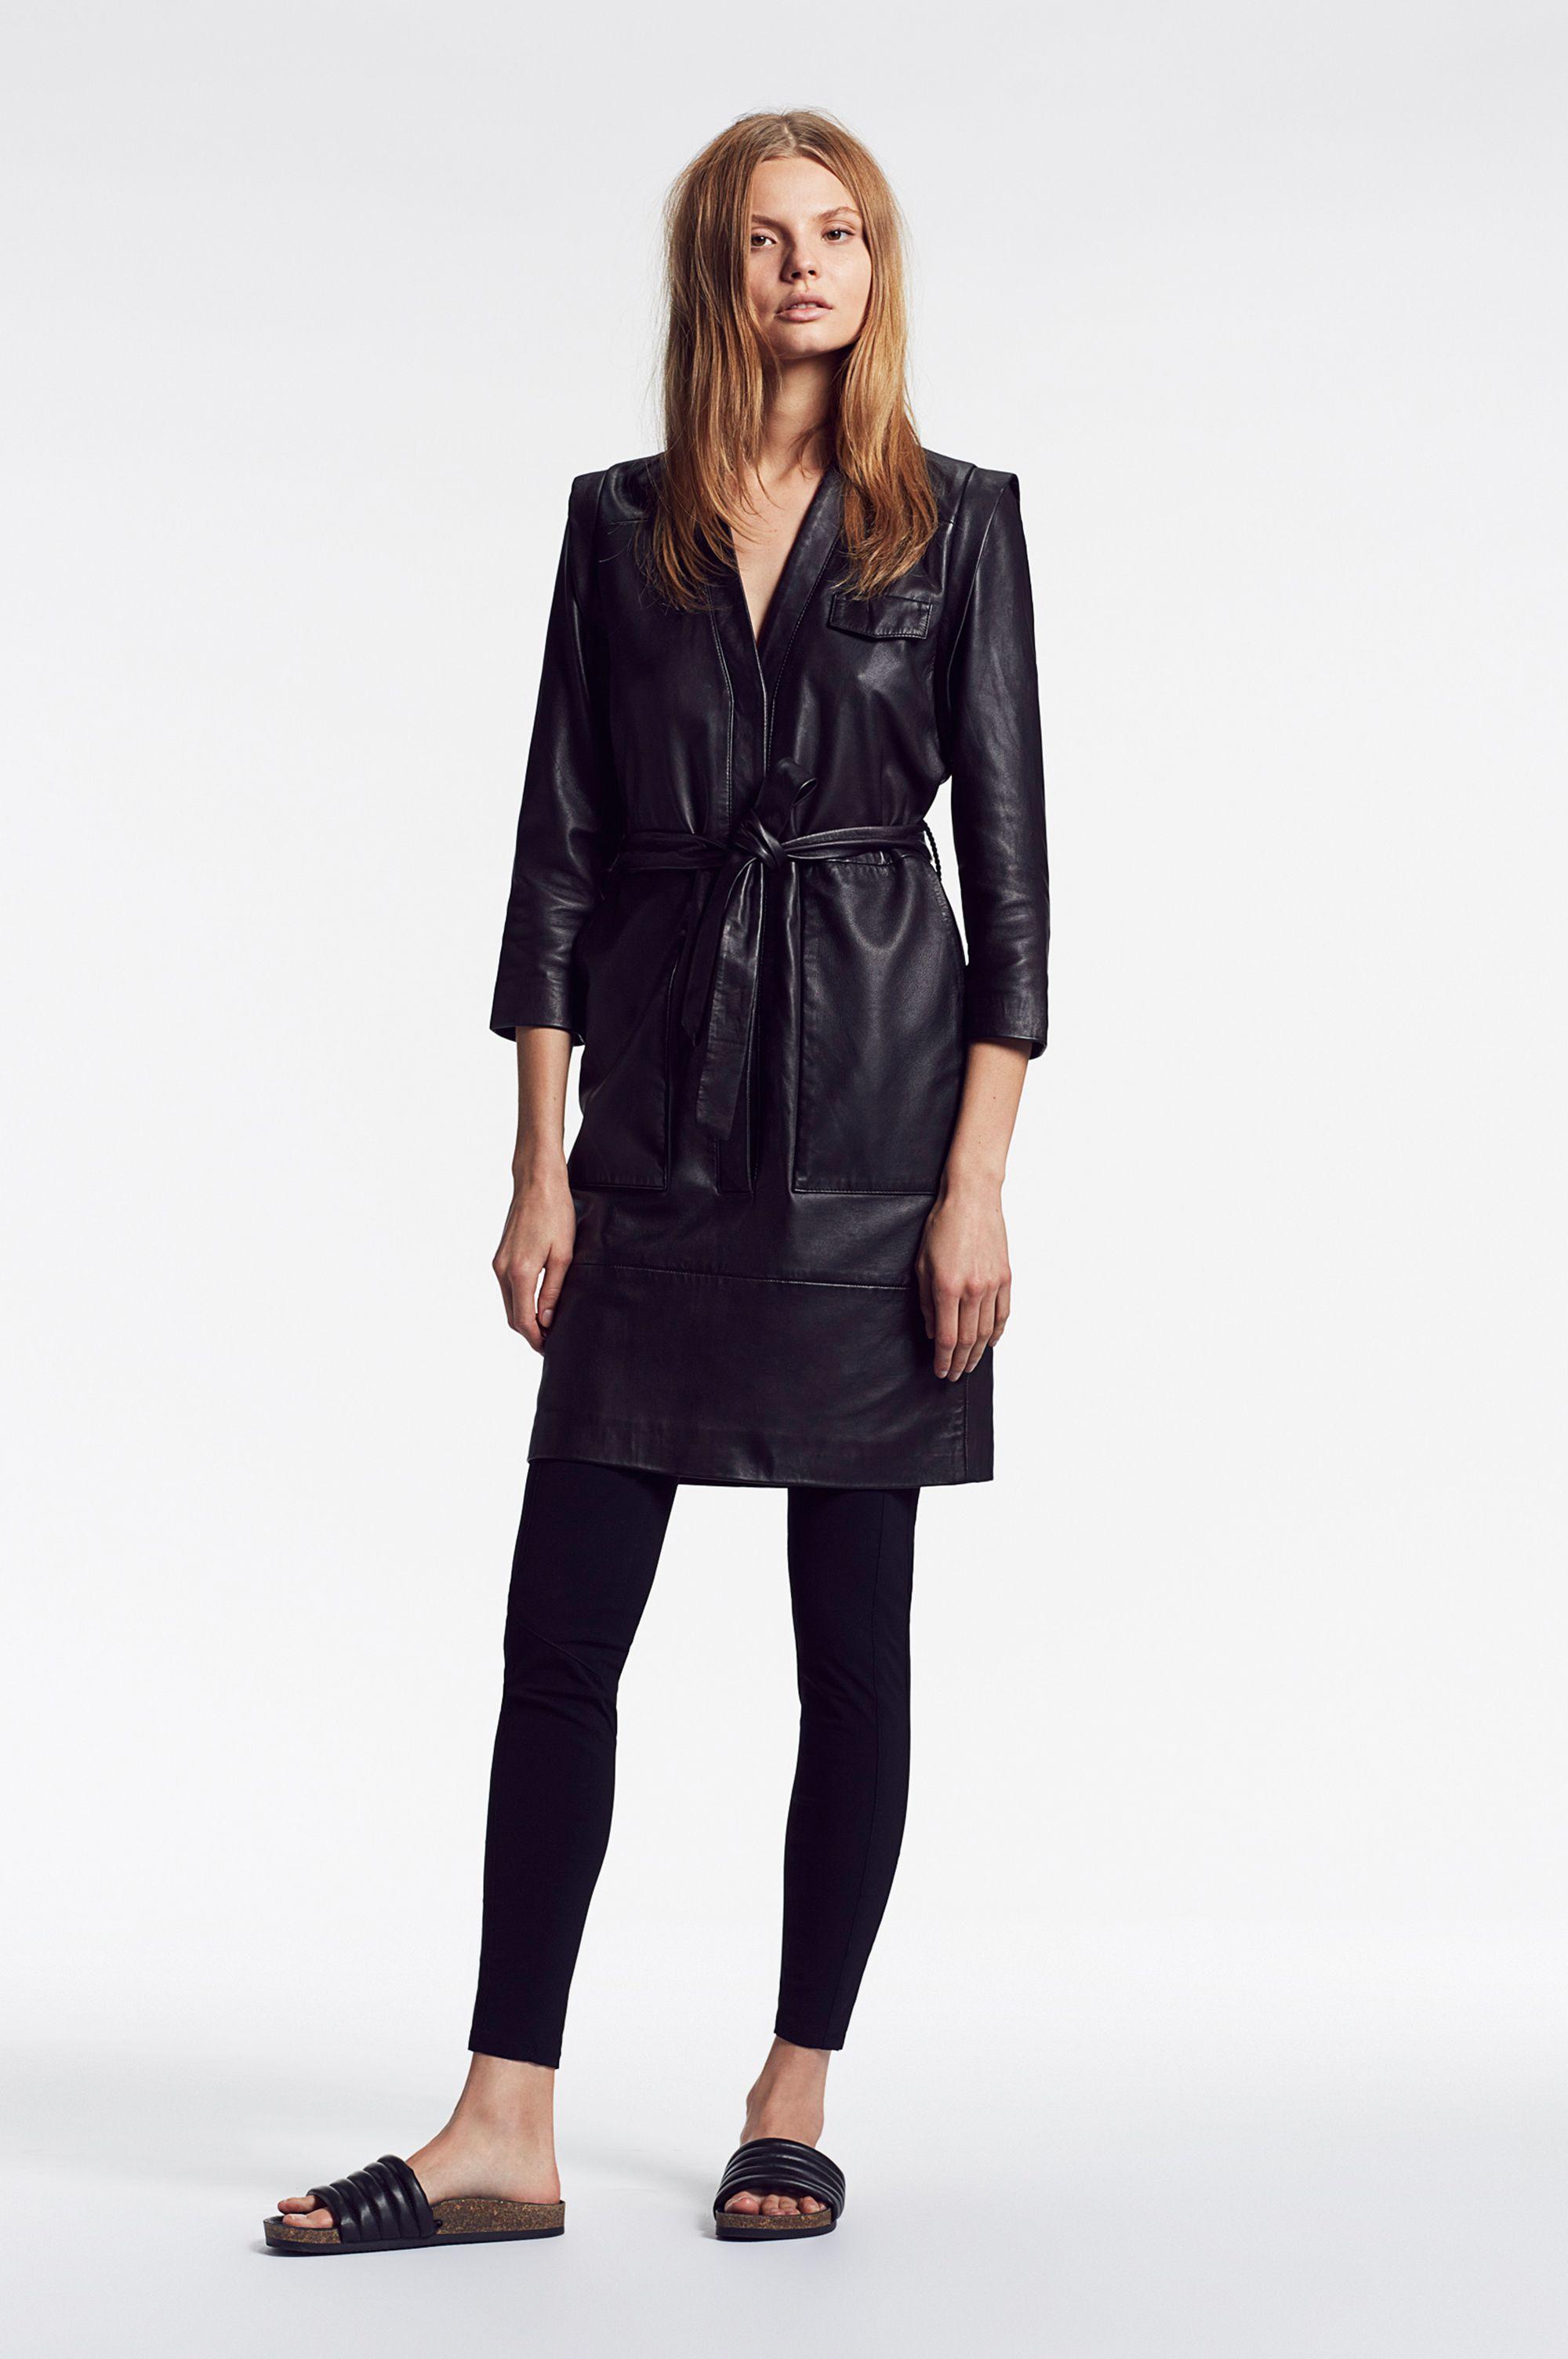 set leather dress set fashion com lederkleid 0051833 leather dresses